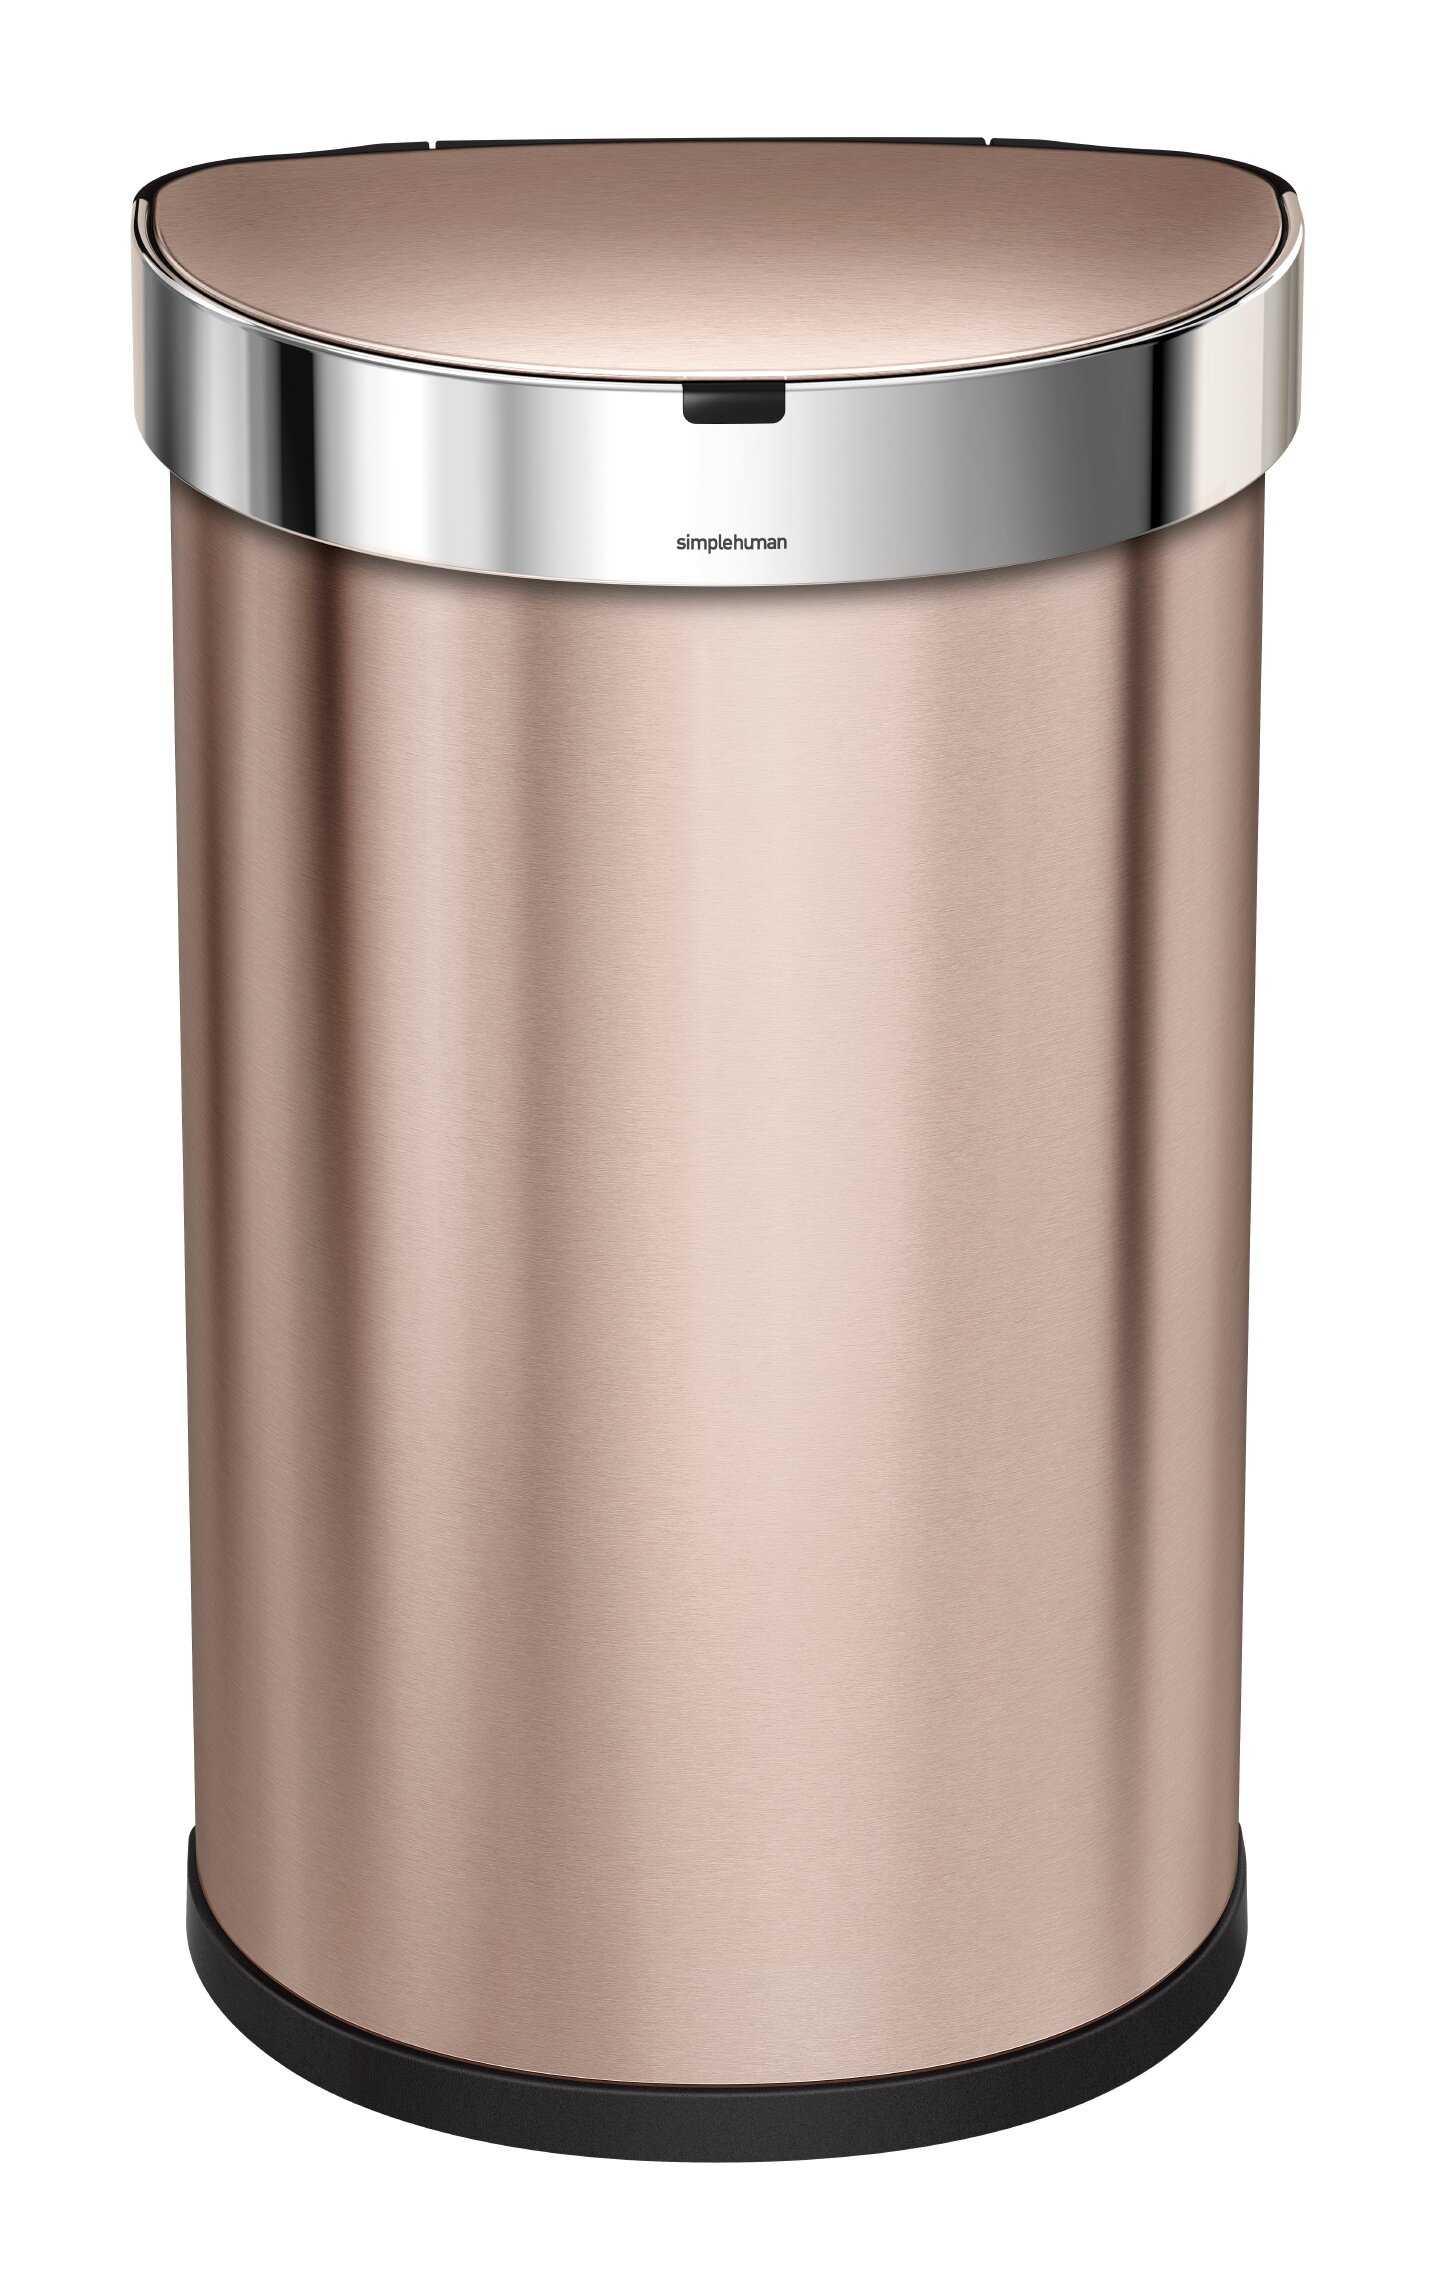 53ae356f976 12 Gallon Semi-Round Sensor Trash Can with Liner Pocket   Reviews ...